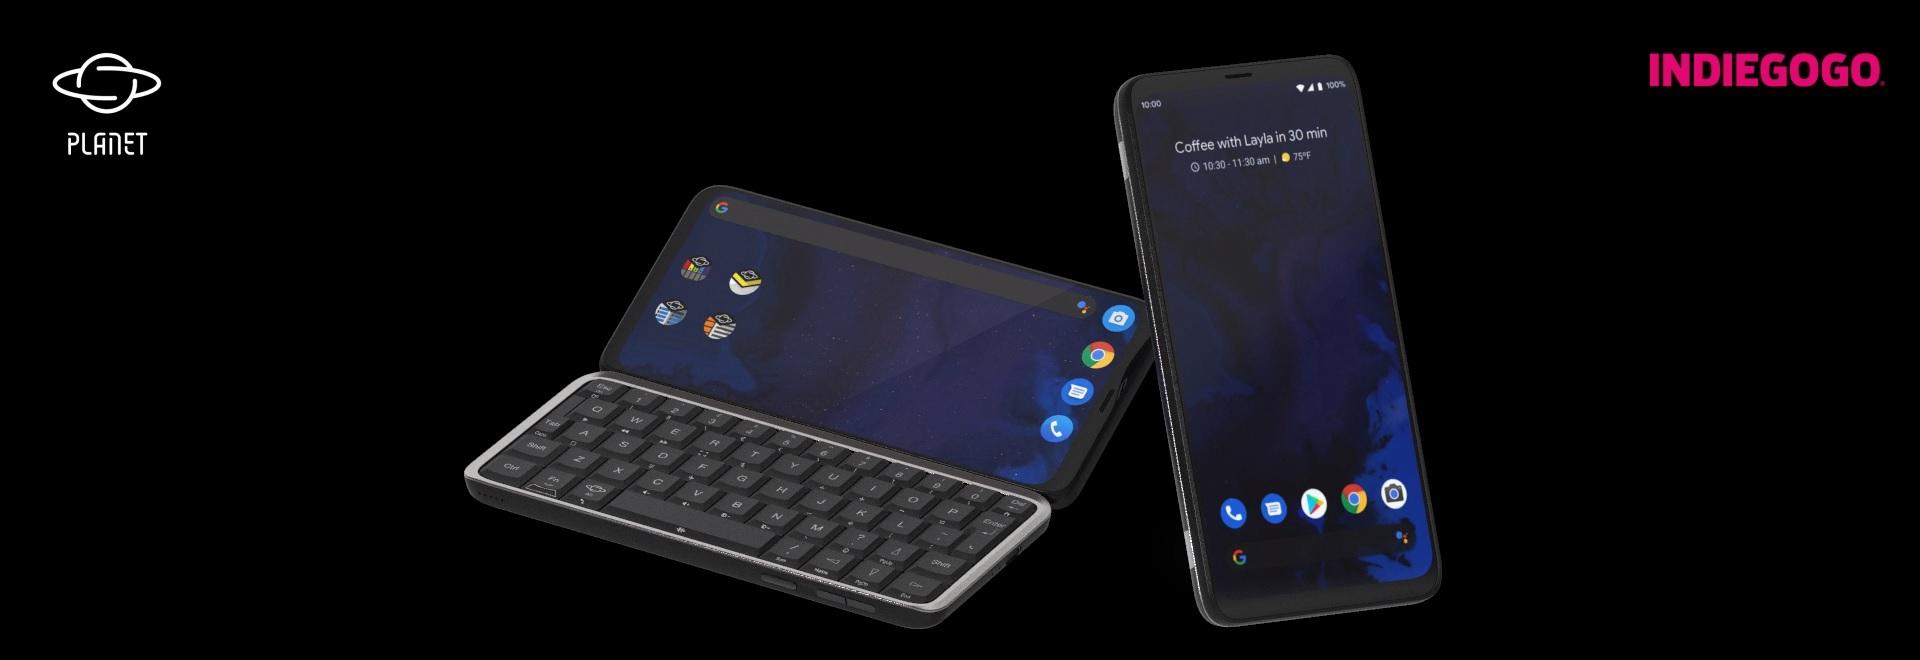 Astro Slide 5G smartphone